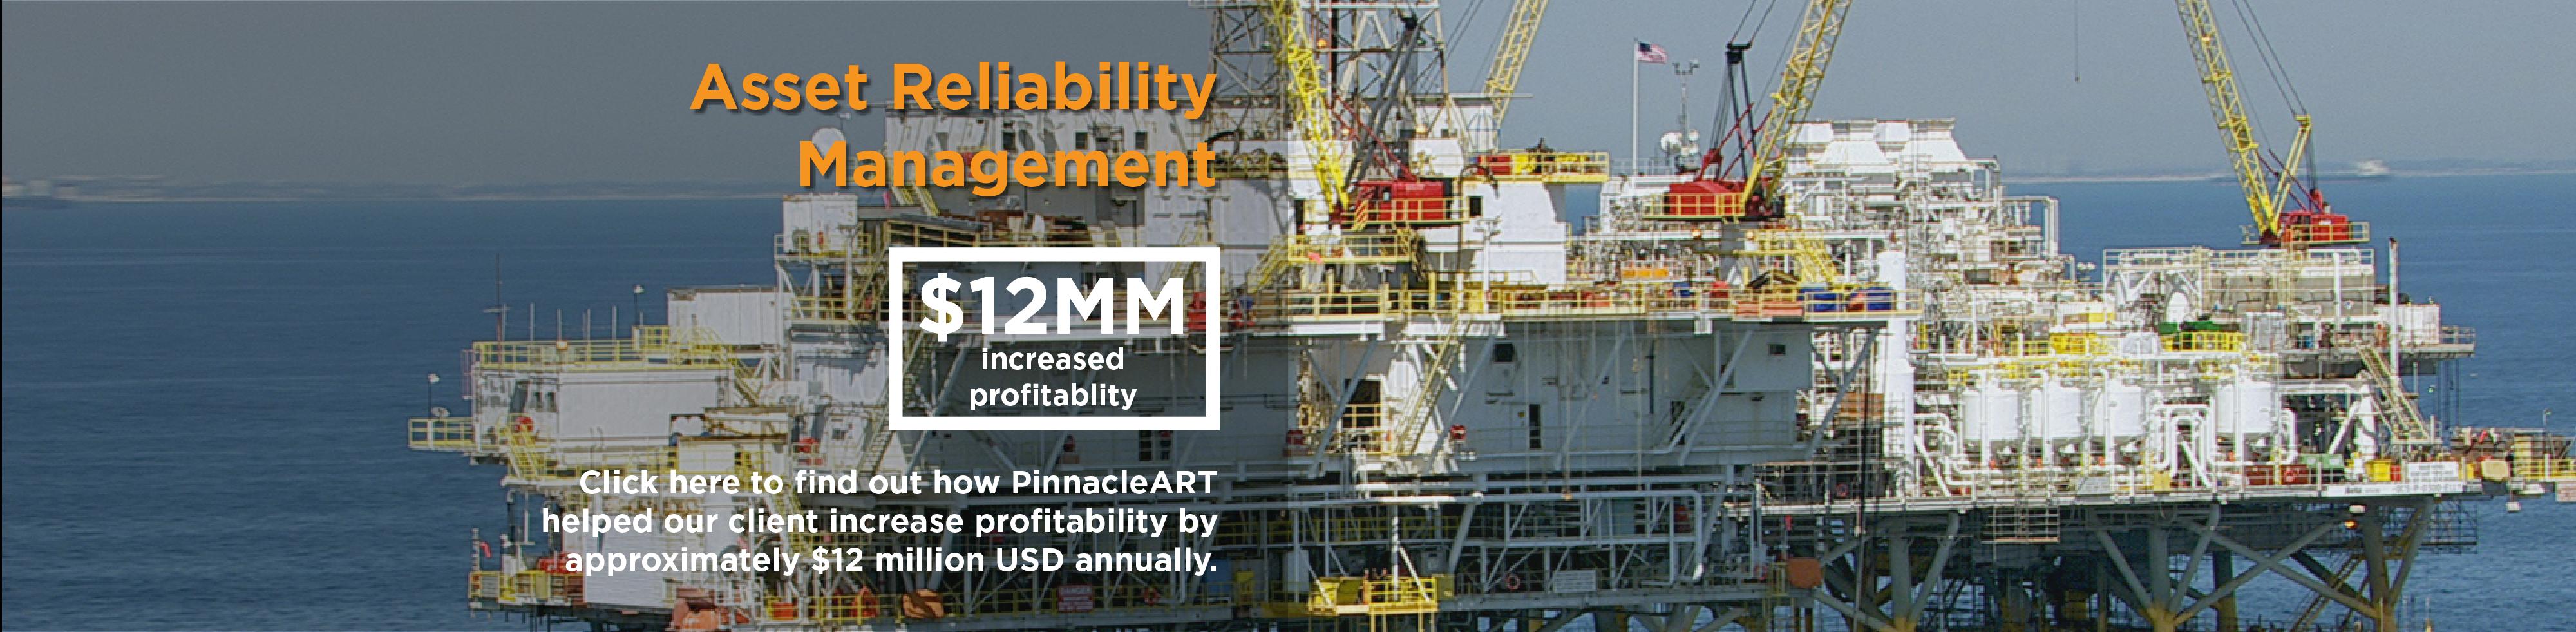 PinnacleART Asset Reliability